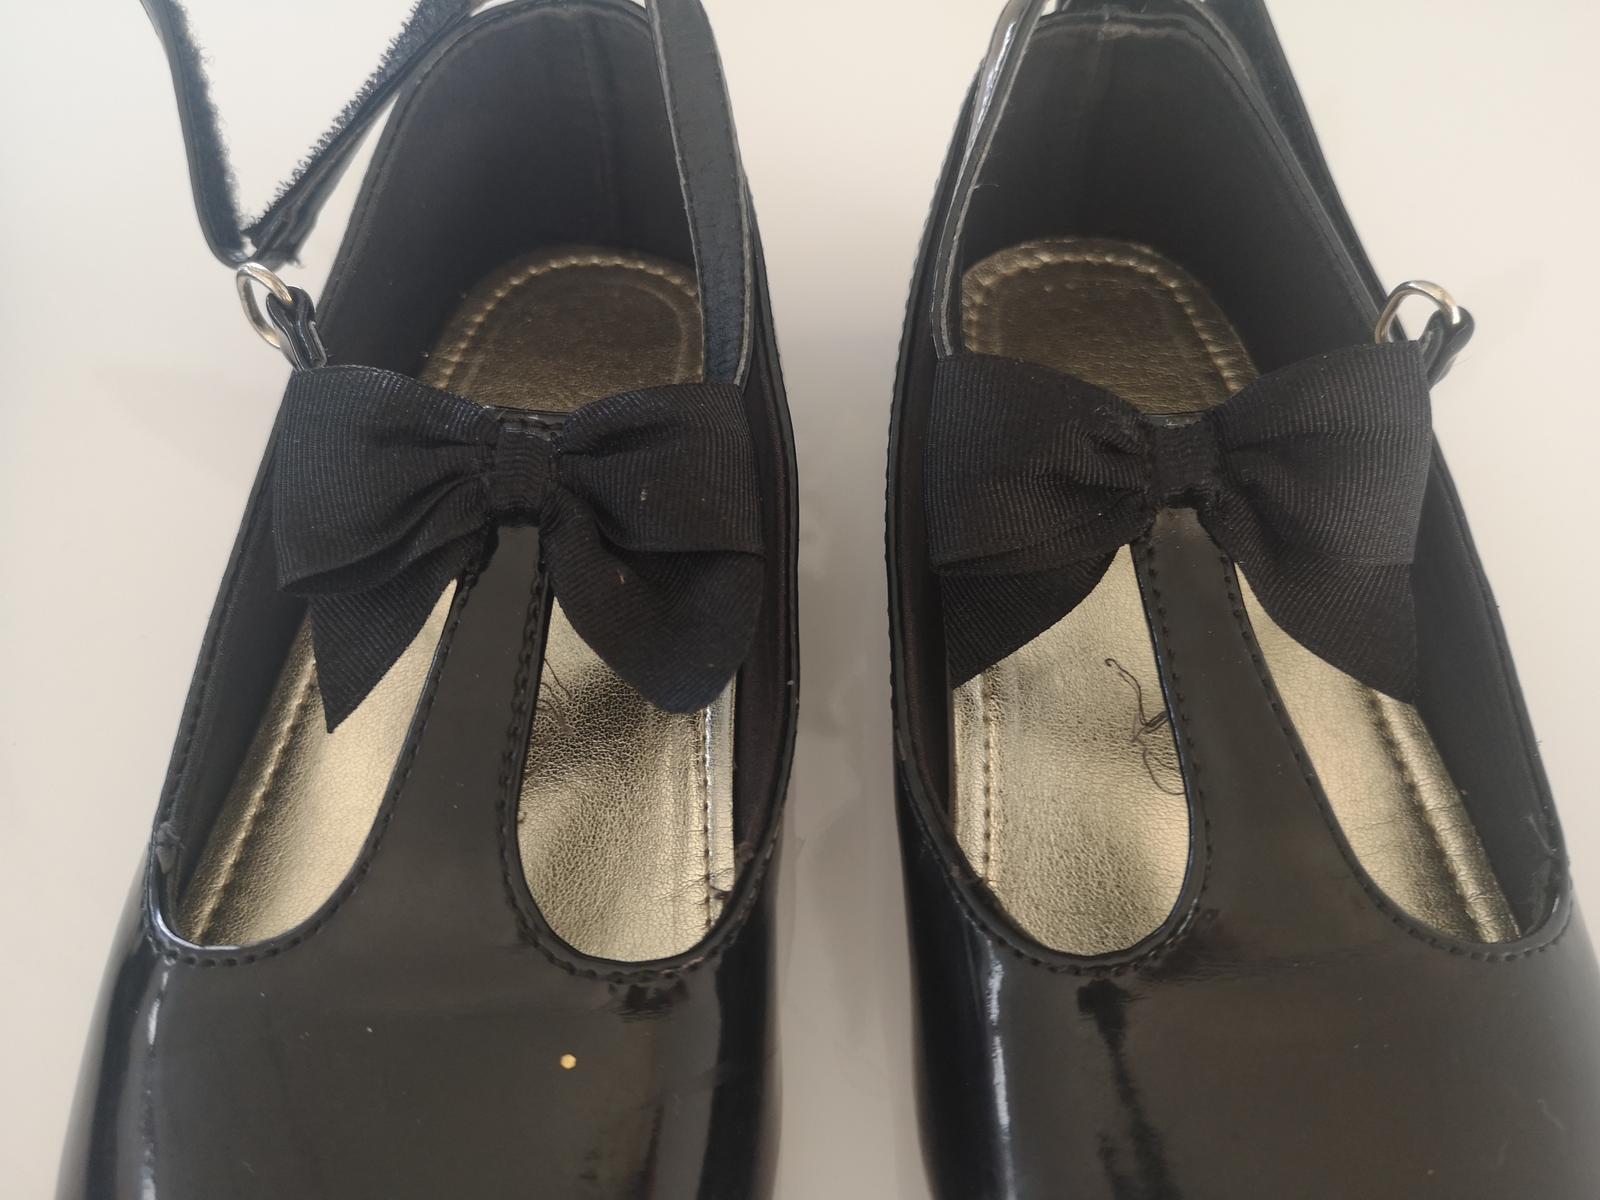 sandálky - Obrázek č. 1